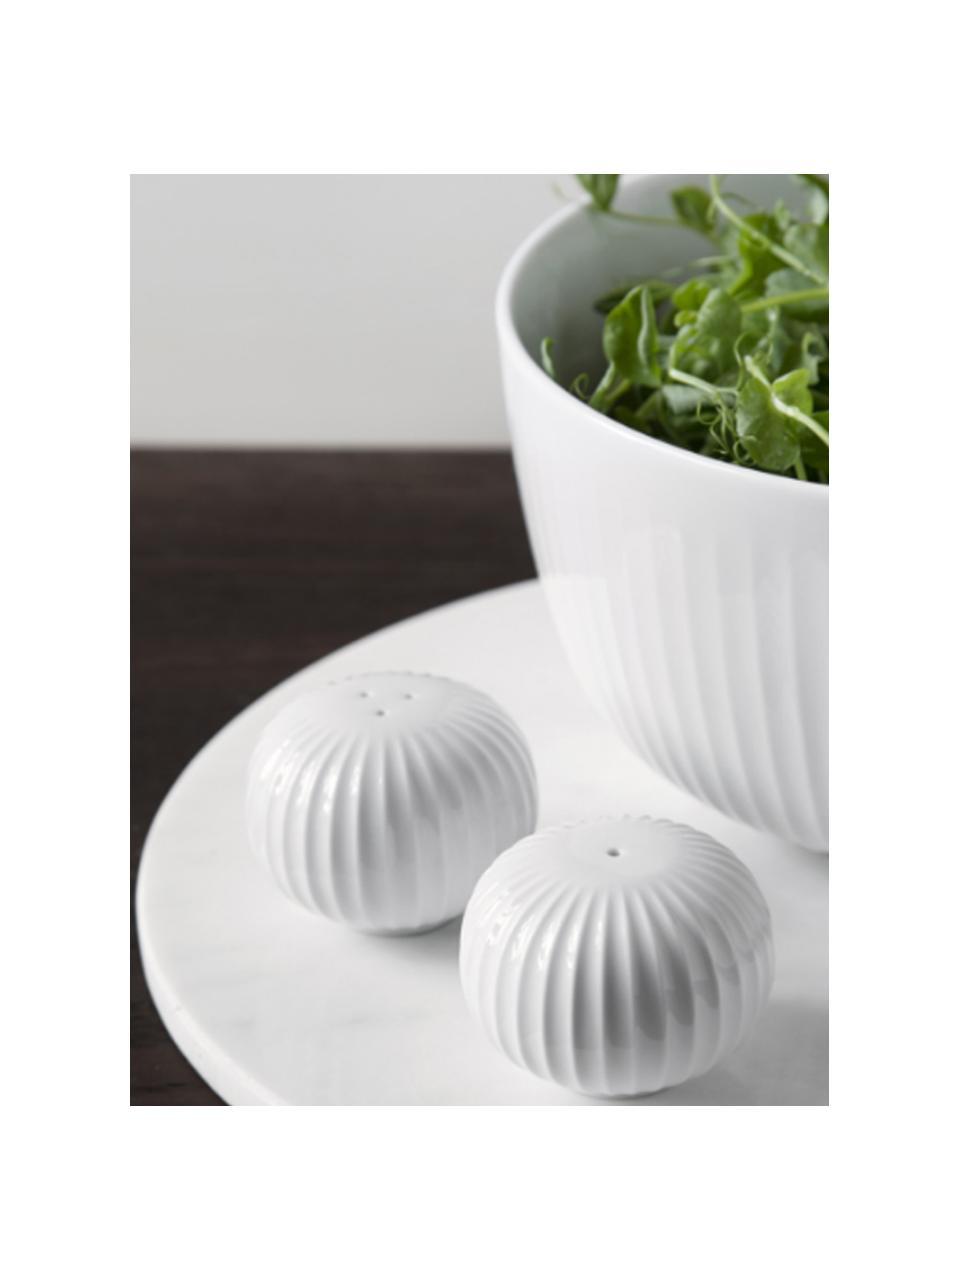 Design zout- en peperstrooierset Hammershøi van keramiek, 2-delig, 100% geglazuurde keramiek, Wit, Ø 6 x H 4 cm